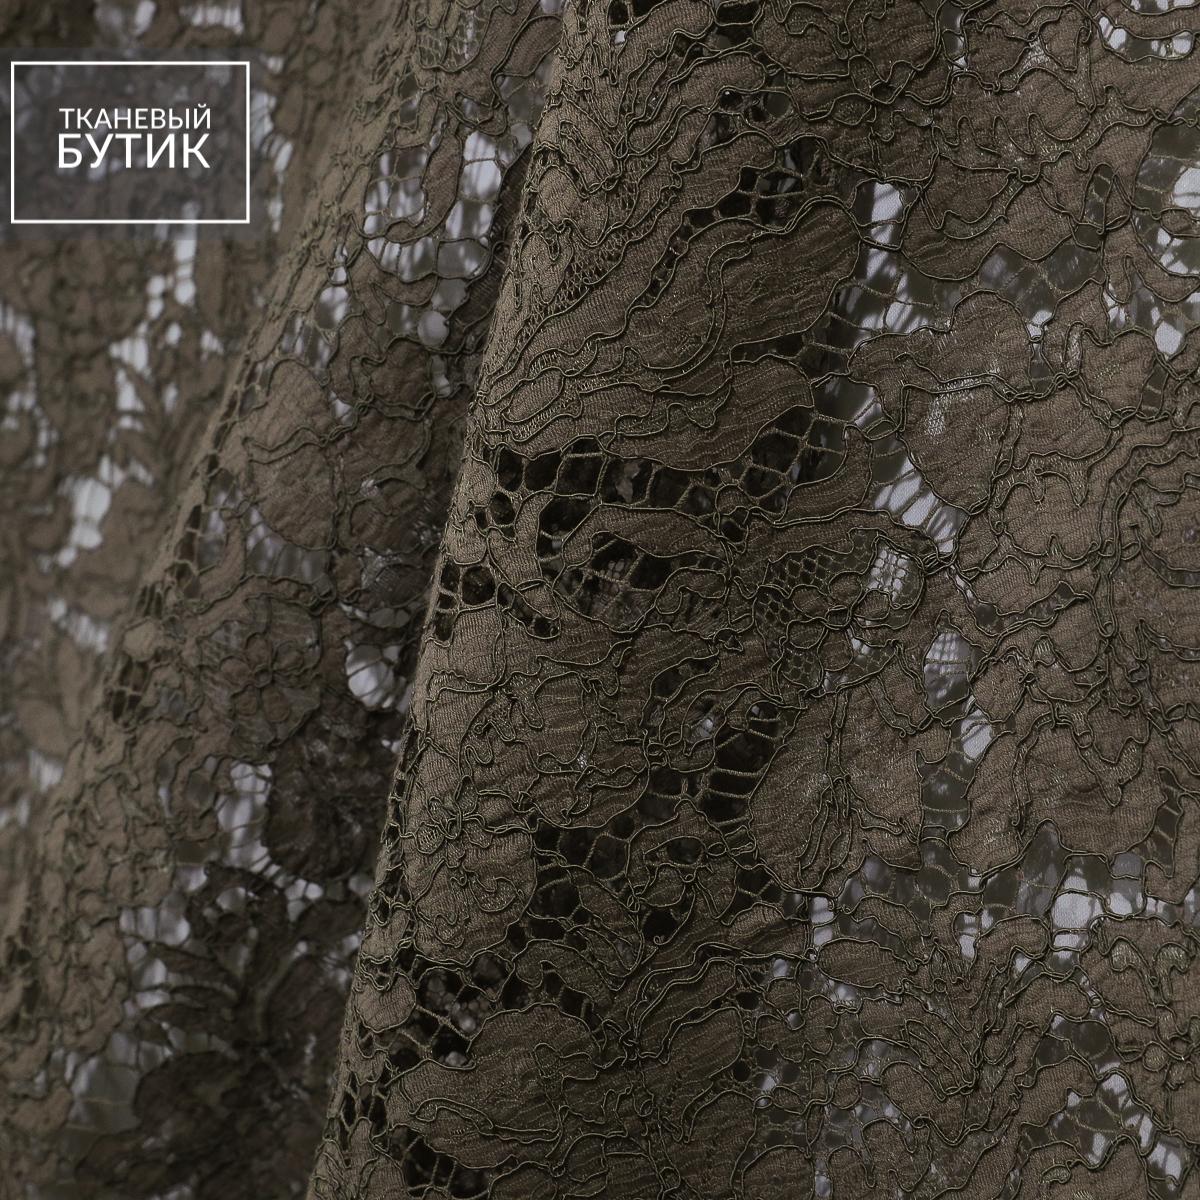 Французское кордовое кружево приглушенно коричневого цвета